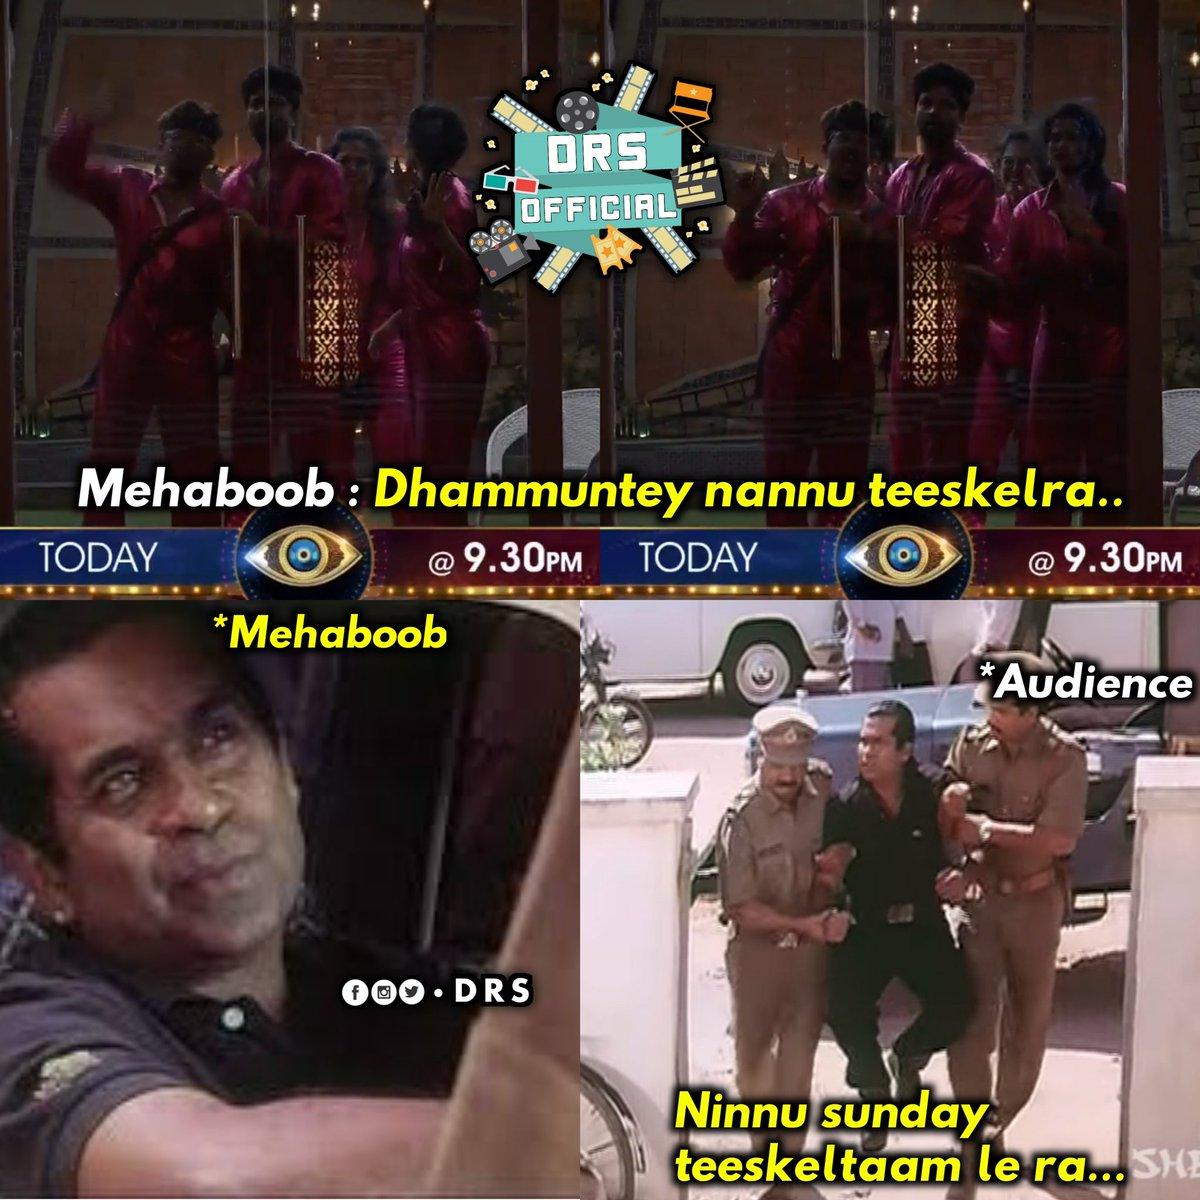 Eeroju picha comedy undela undi.. #BiggBossTelugu4 😂 #Nagarjuna #AkkineniNagarjuna #TeluguBiggBoss4 #biggboss4telugu #BiggBoss @StarMaa @DRSofficialpage #DRS https://t.co/G0SErl8Xwf